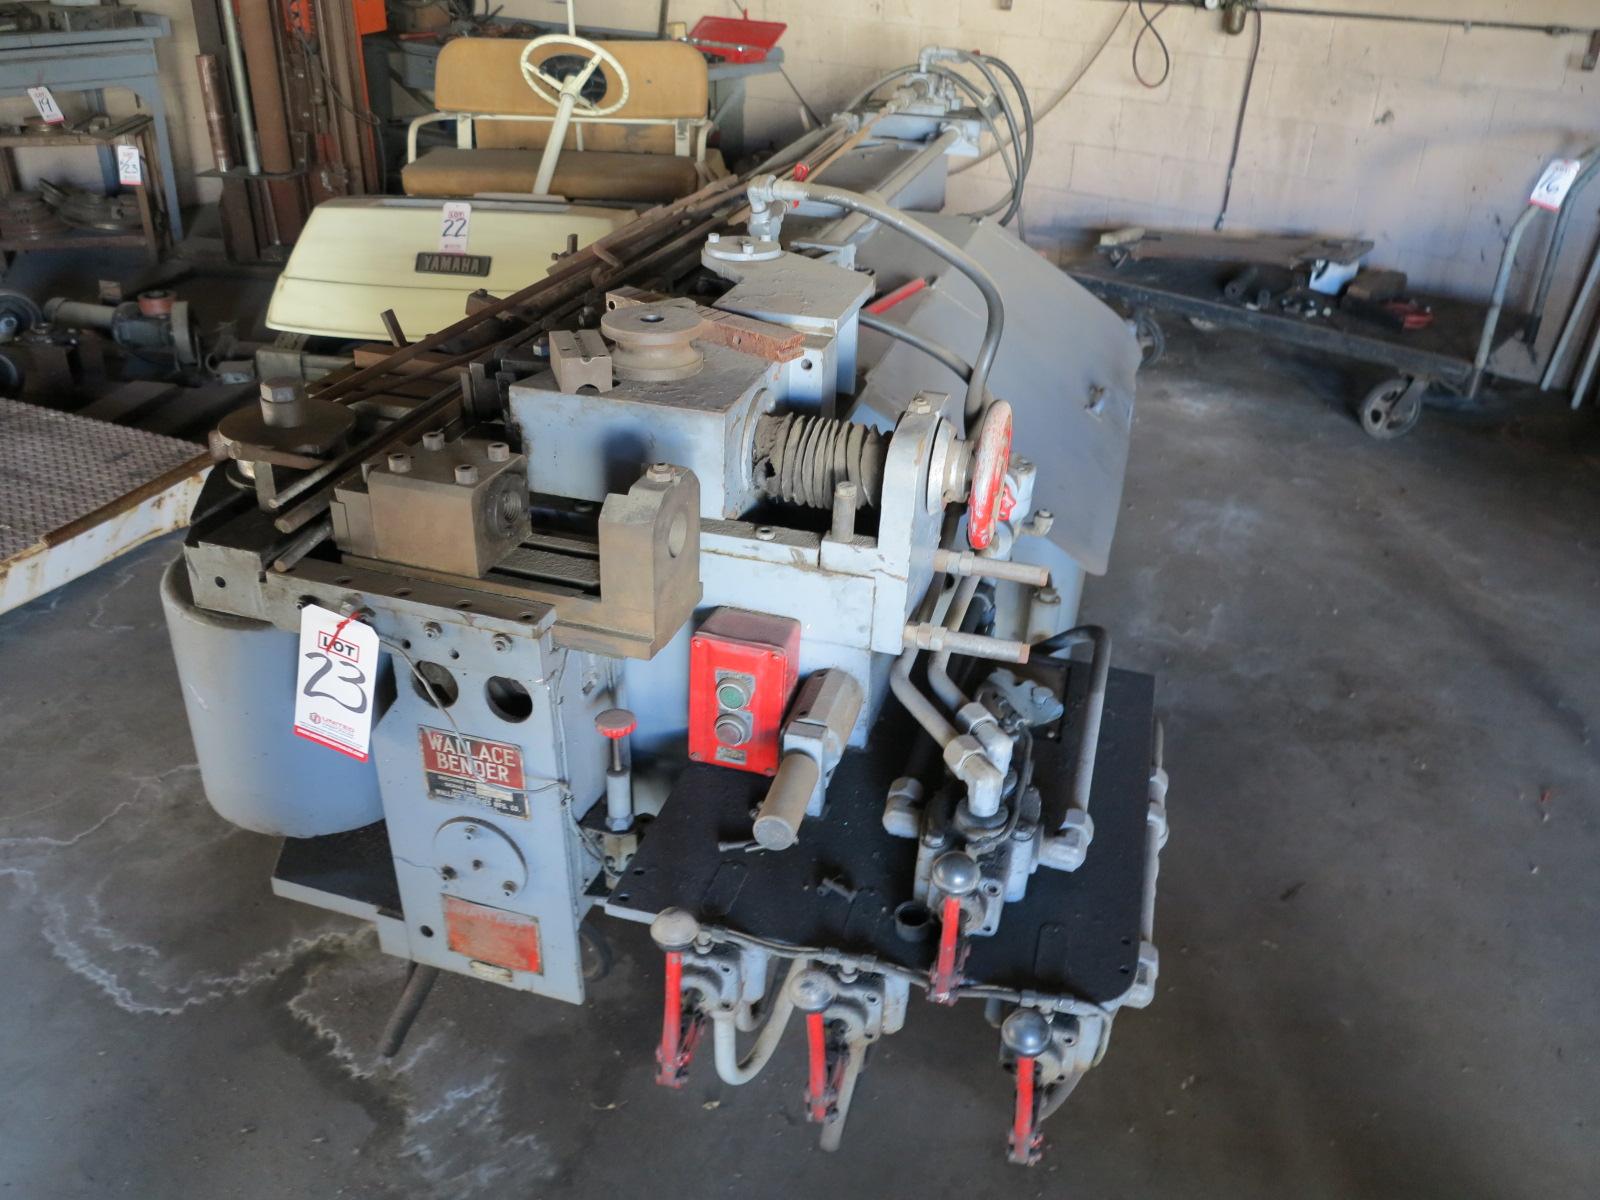 Lot 23 - WALLACE BENDER POWER BENDING MACHINE, MACHINE NO. 500-1, S/N 4059